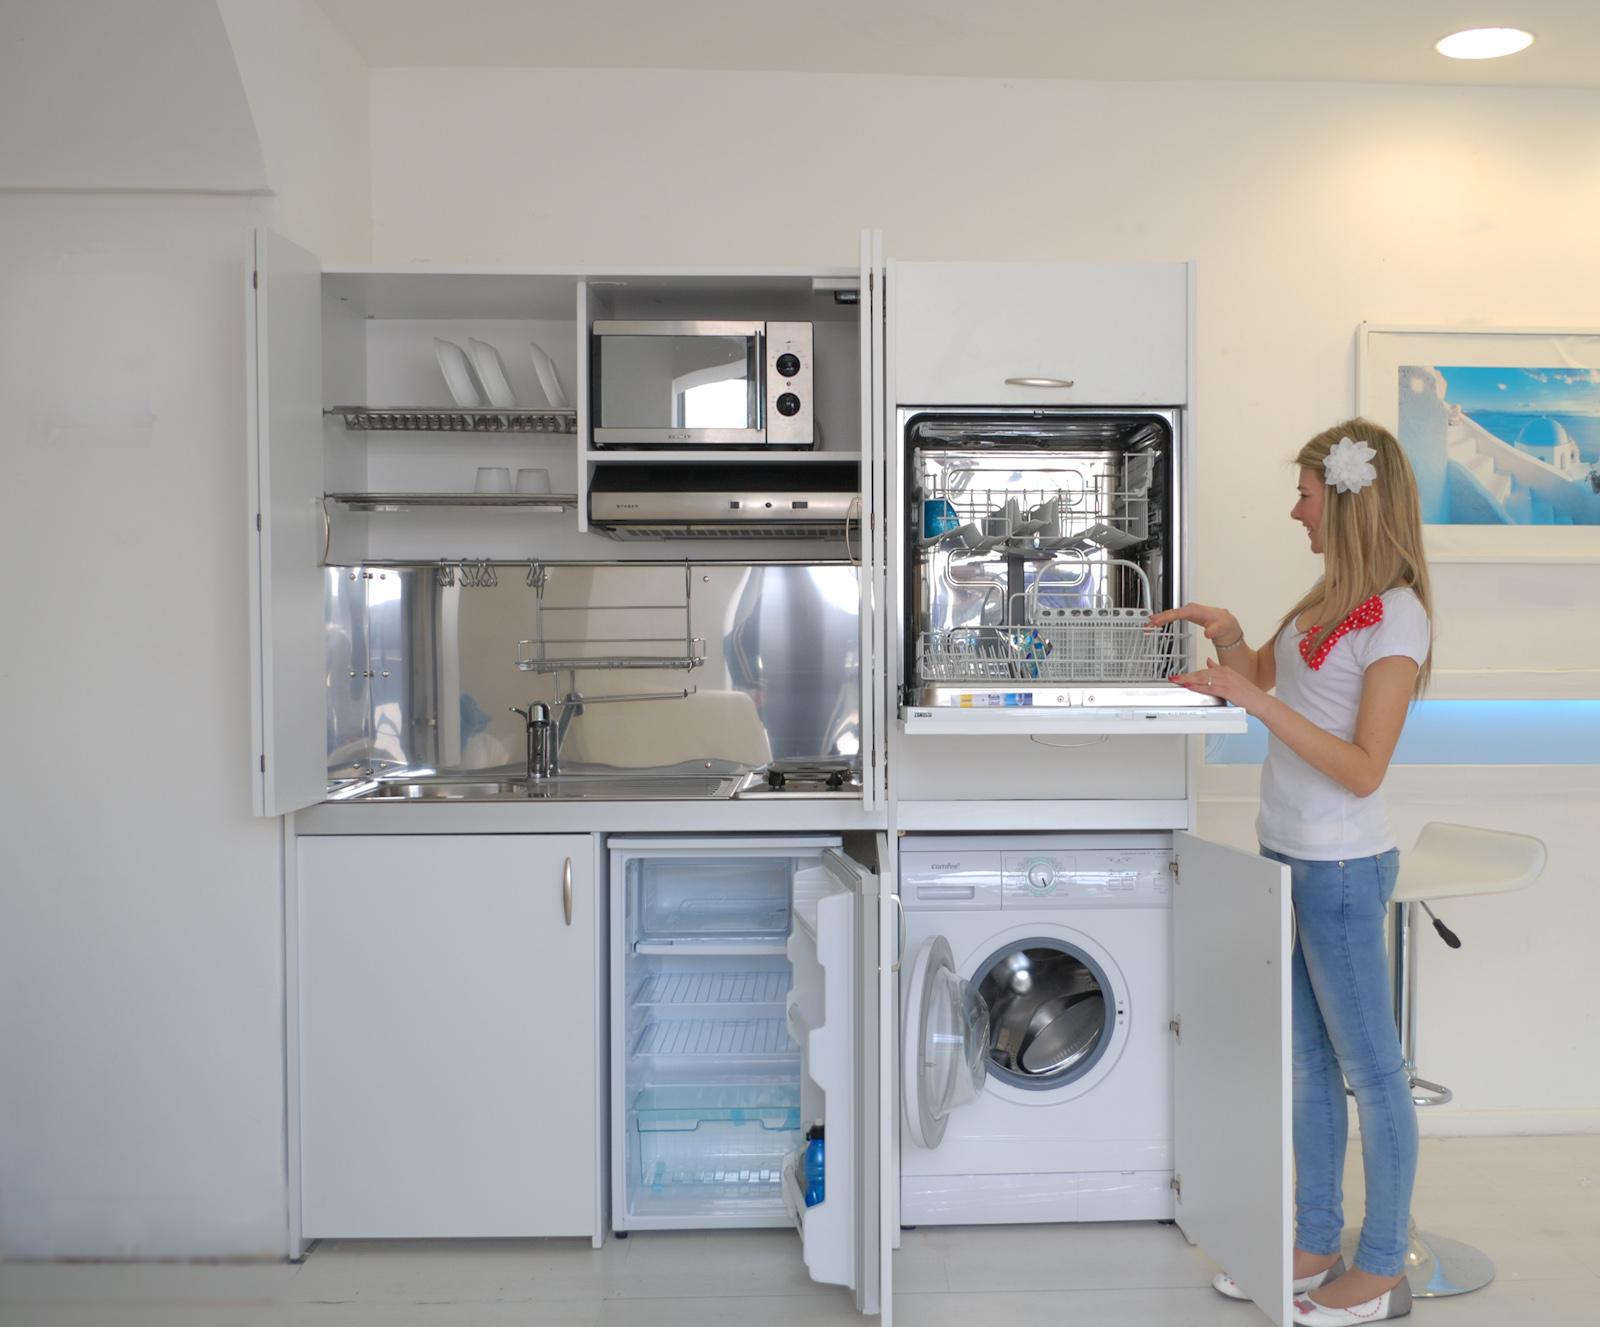 Monoblocco cucine salvaspazio compact con serranda for Cucina in armadio